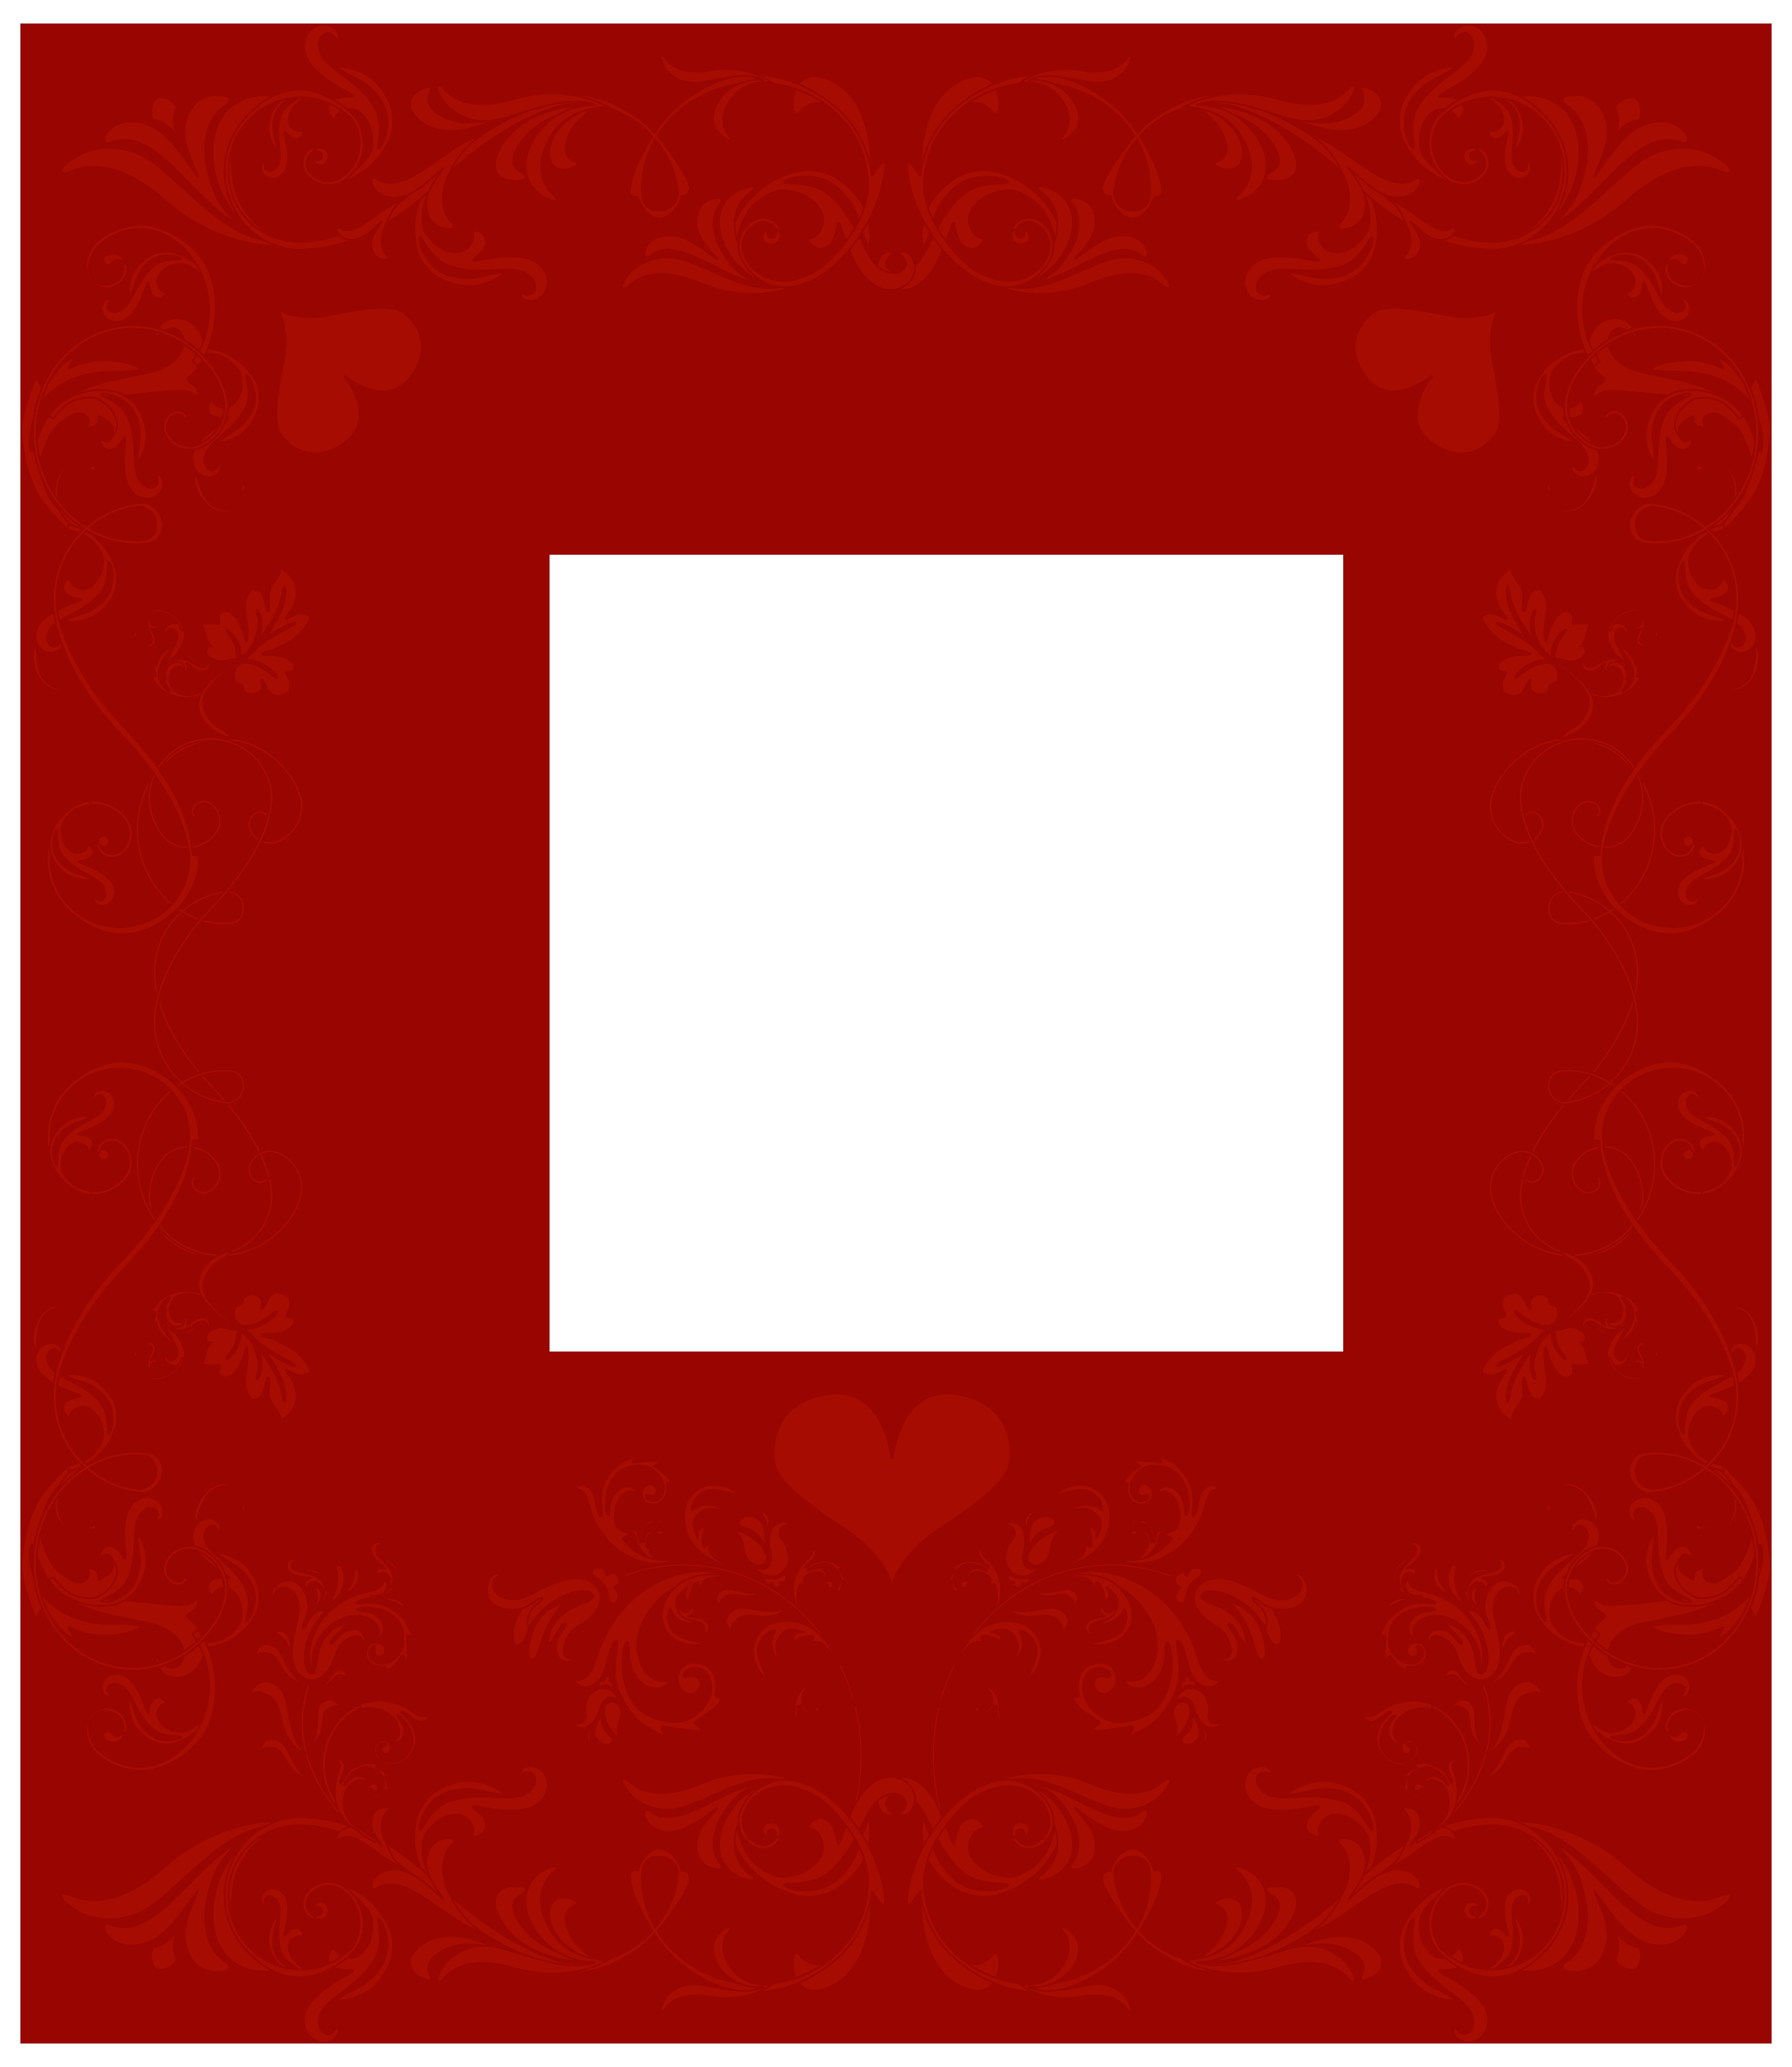 6936x8000 Valentine's Day Decorative Border Transparent Png Clip Art Image